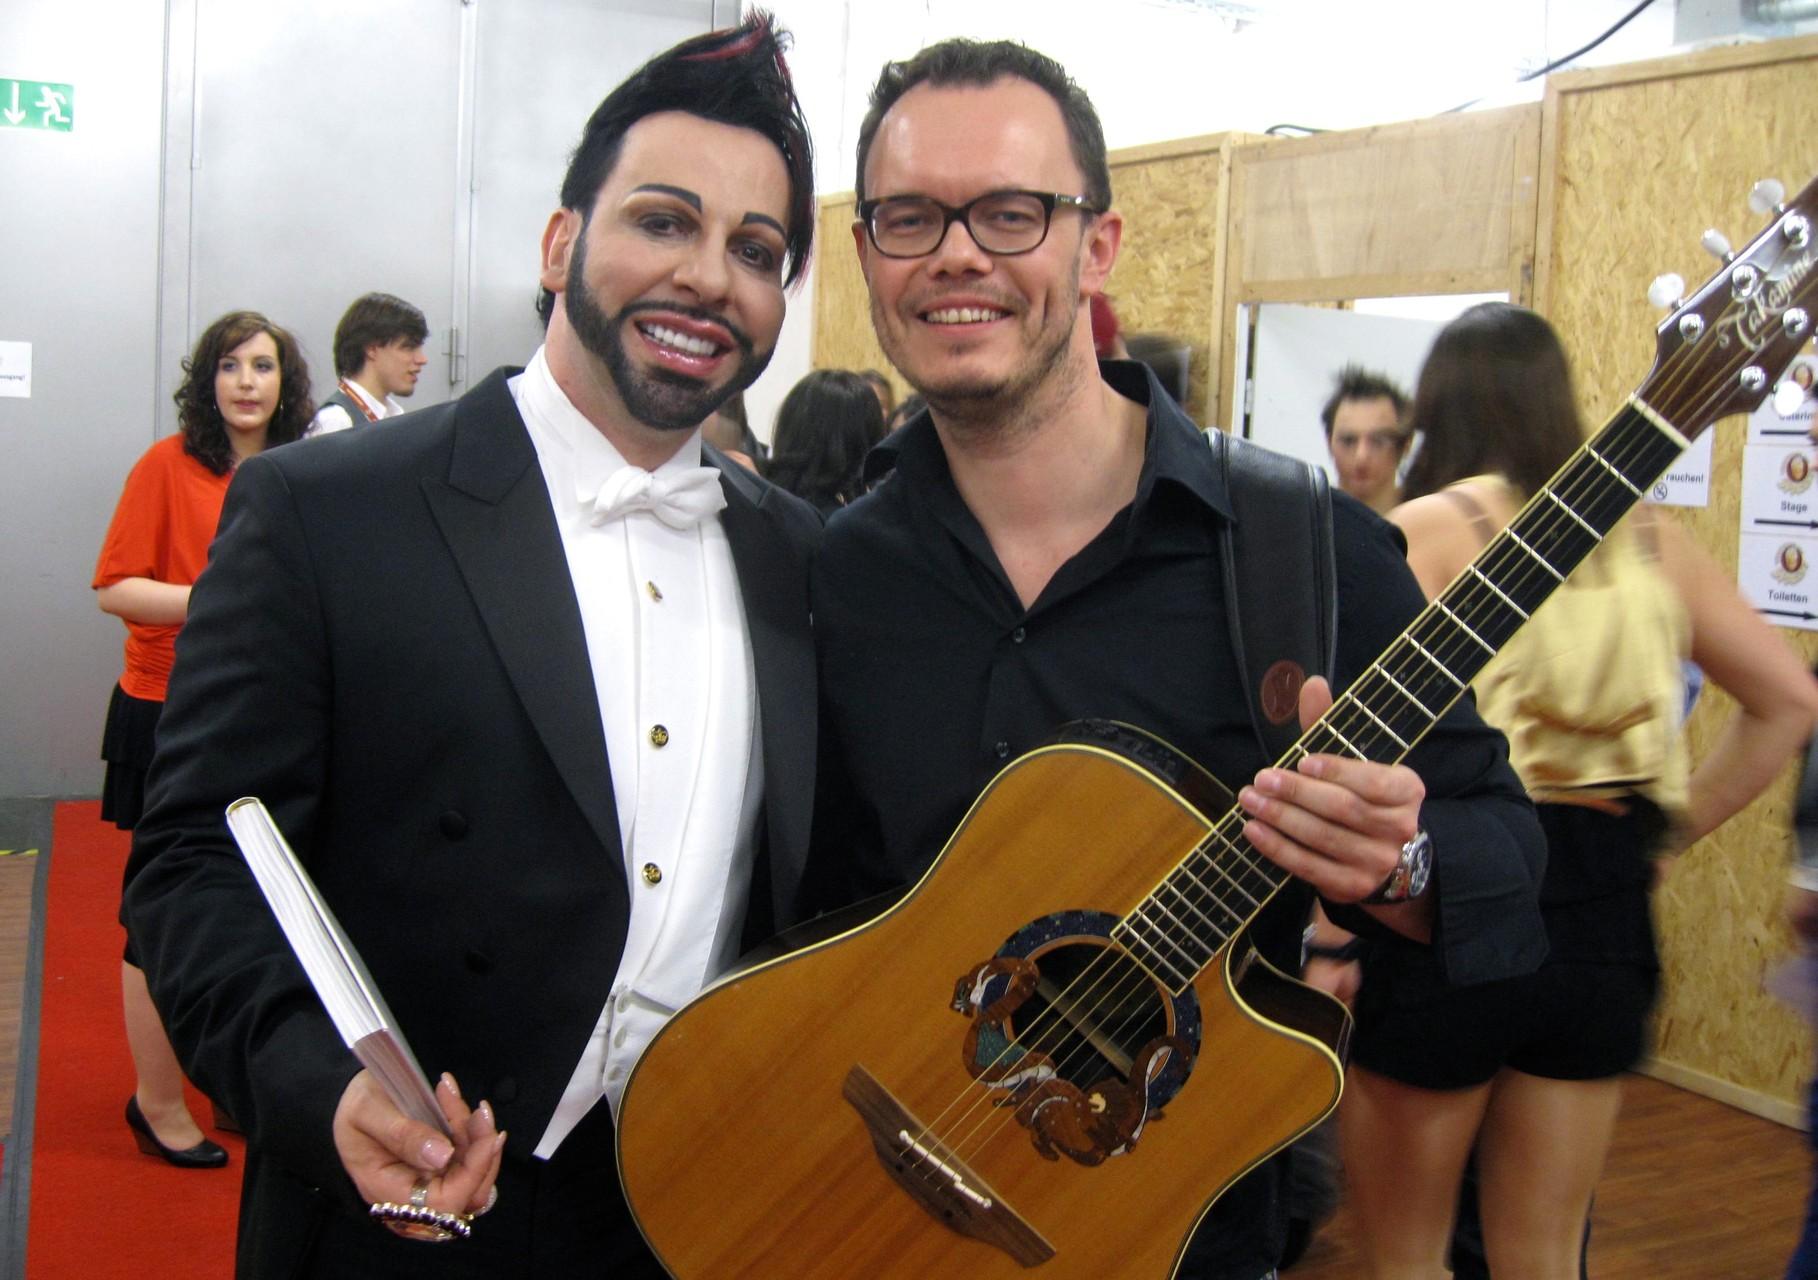 Damian and Mr. Glöggler